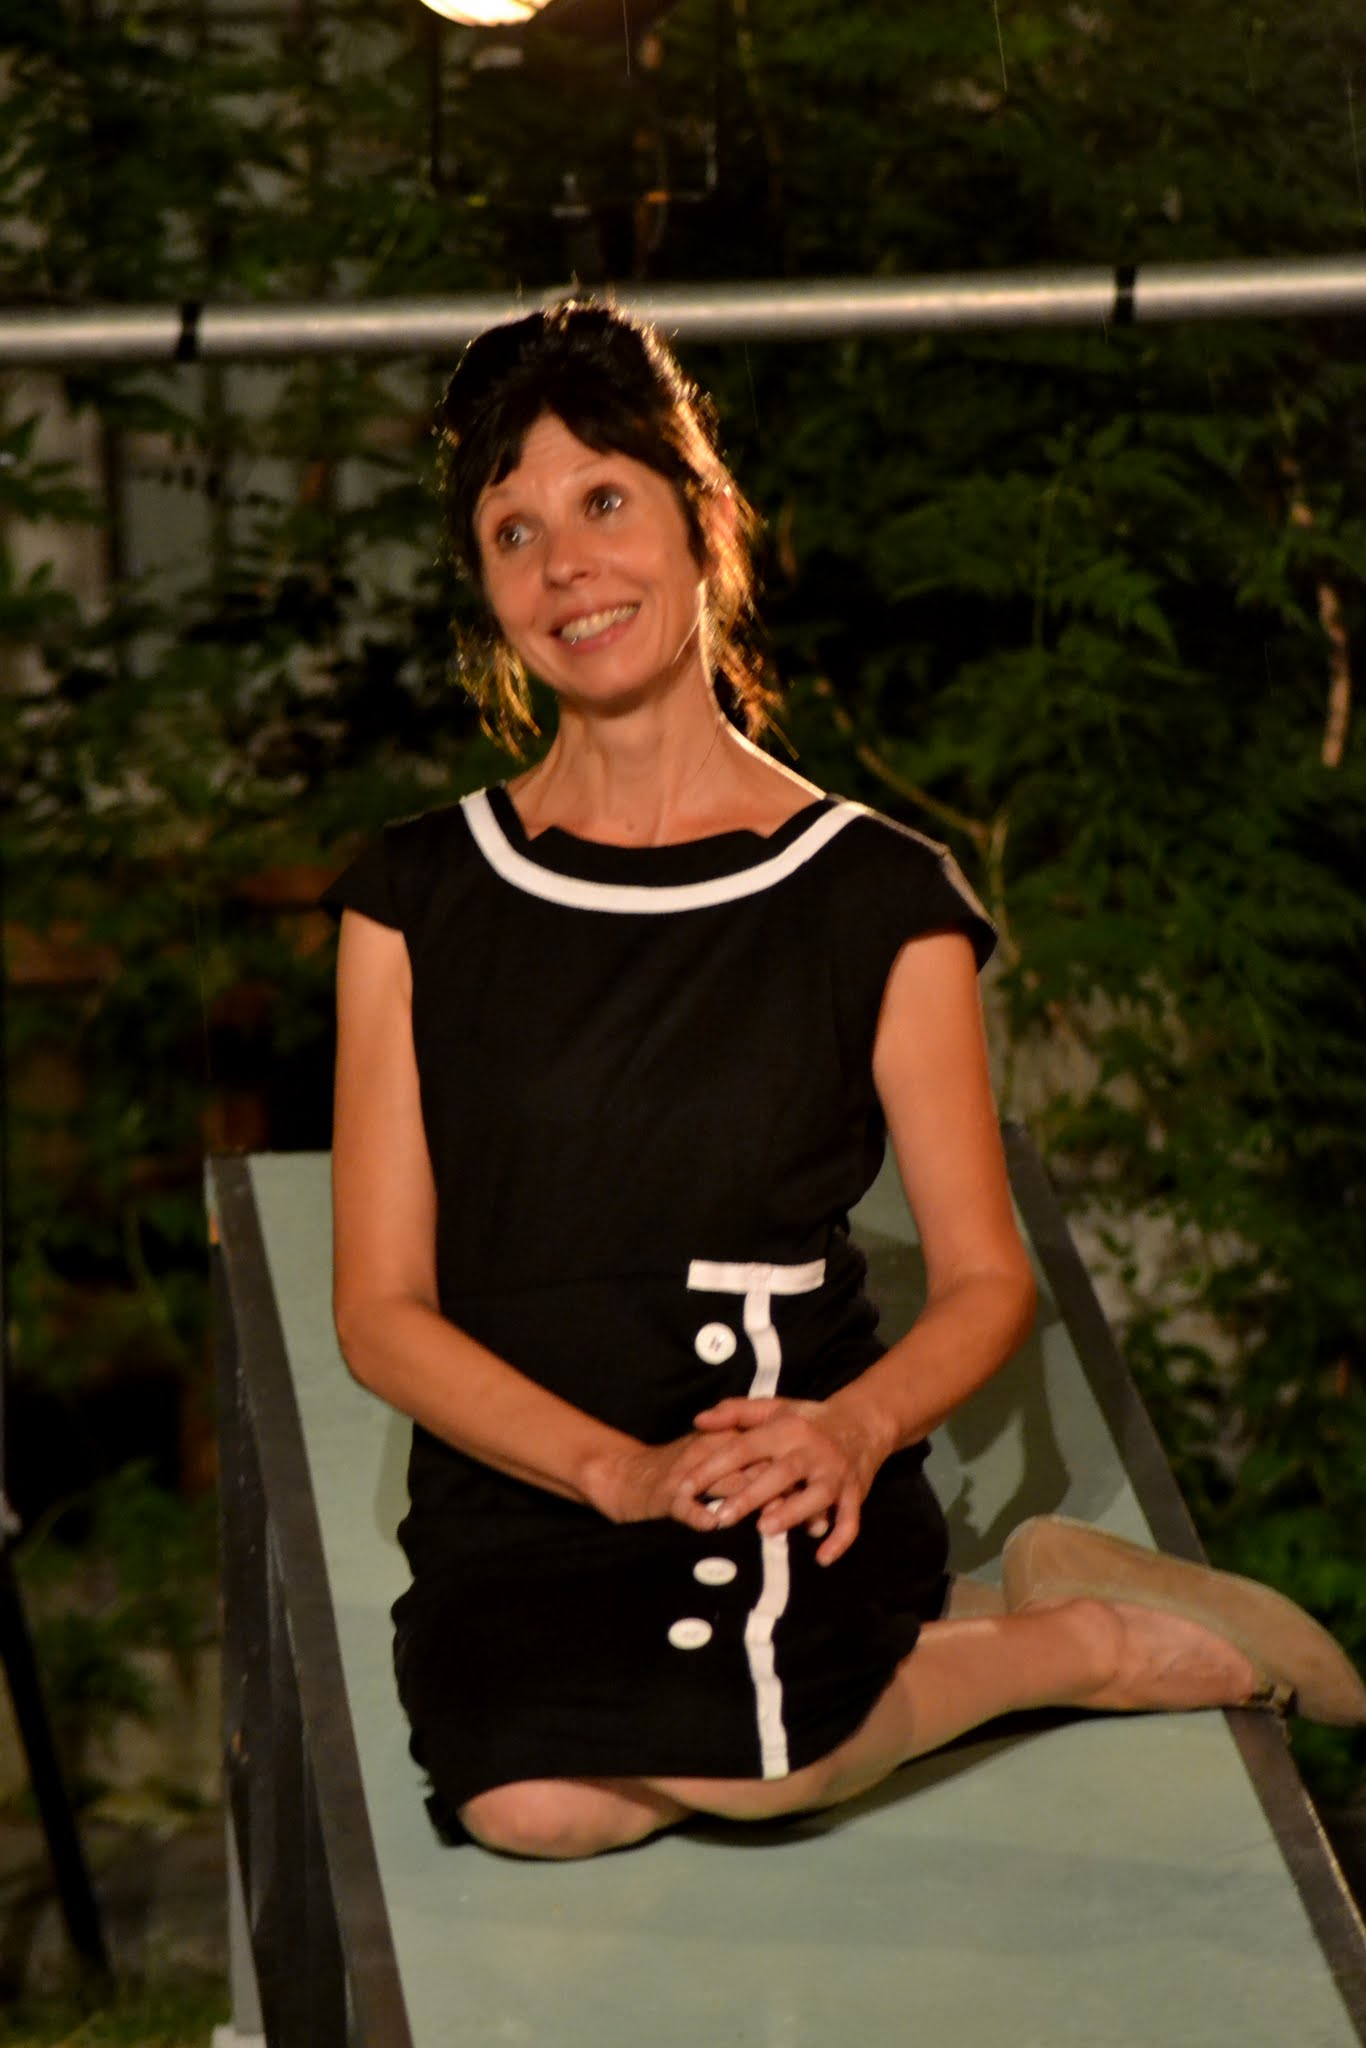 FCVT-2017-Marion tritta-Dame de chez Maxim (8)